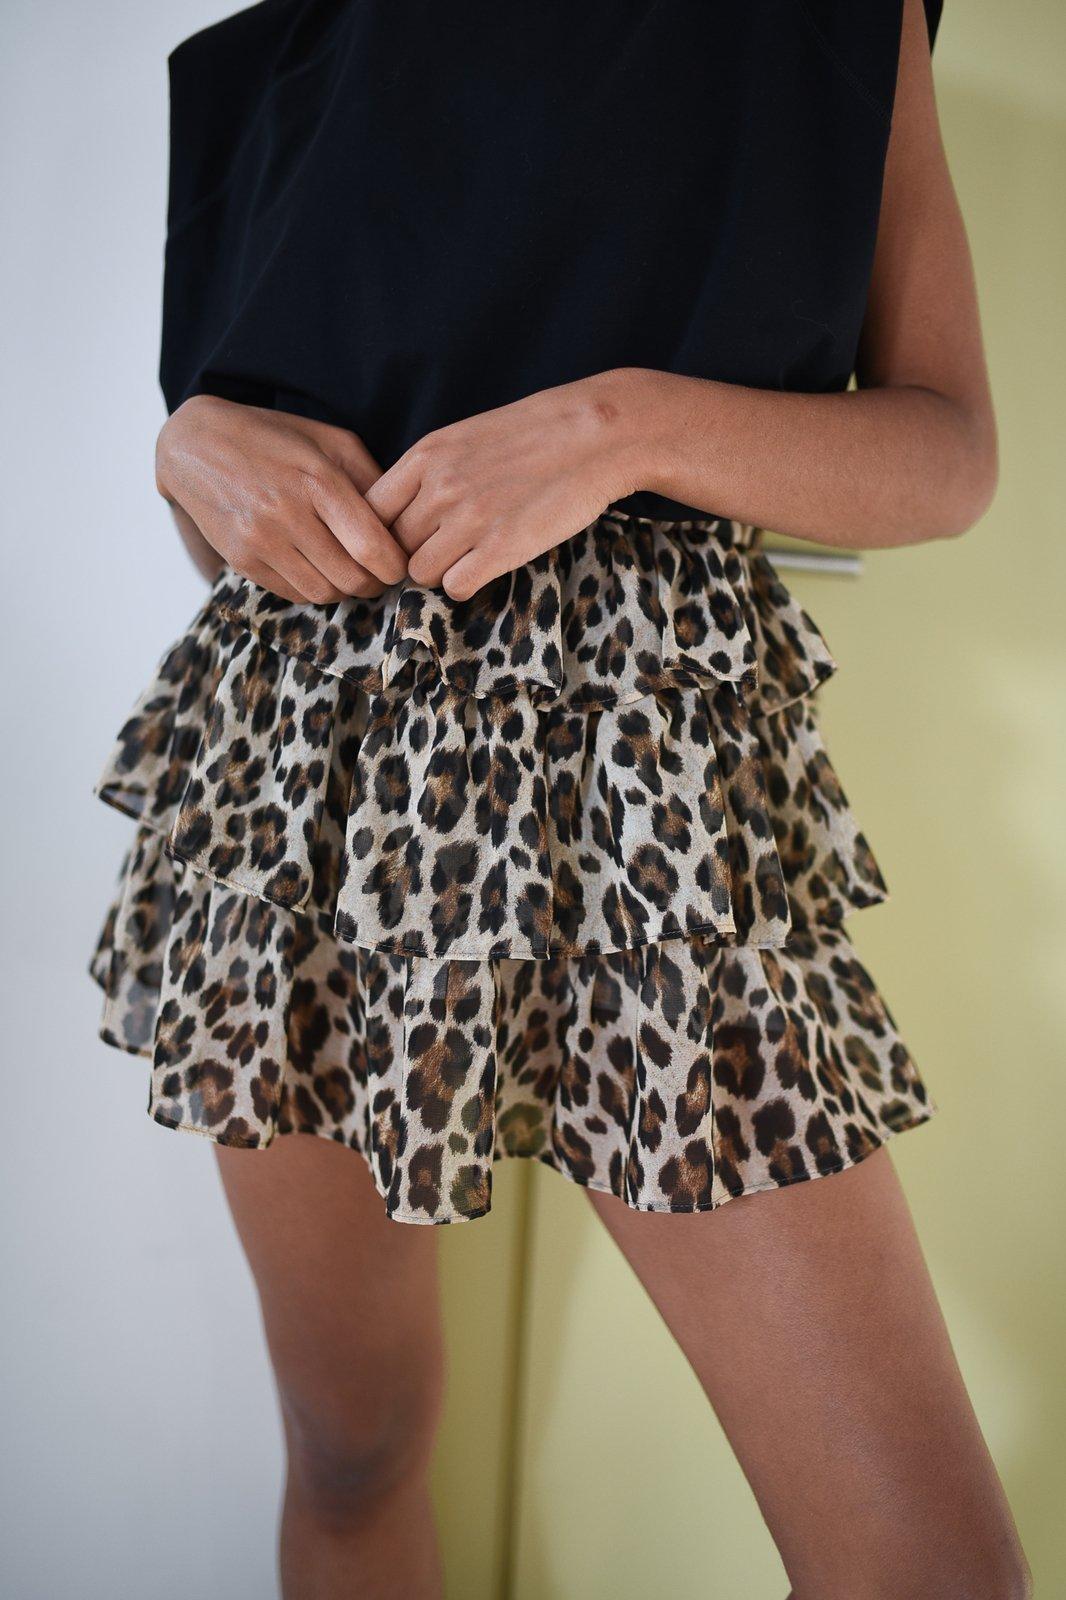 CHEAP Lana Wild Skirt 28617023989 – Women's Dresses & Skirts